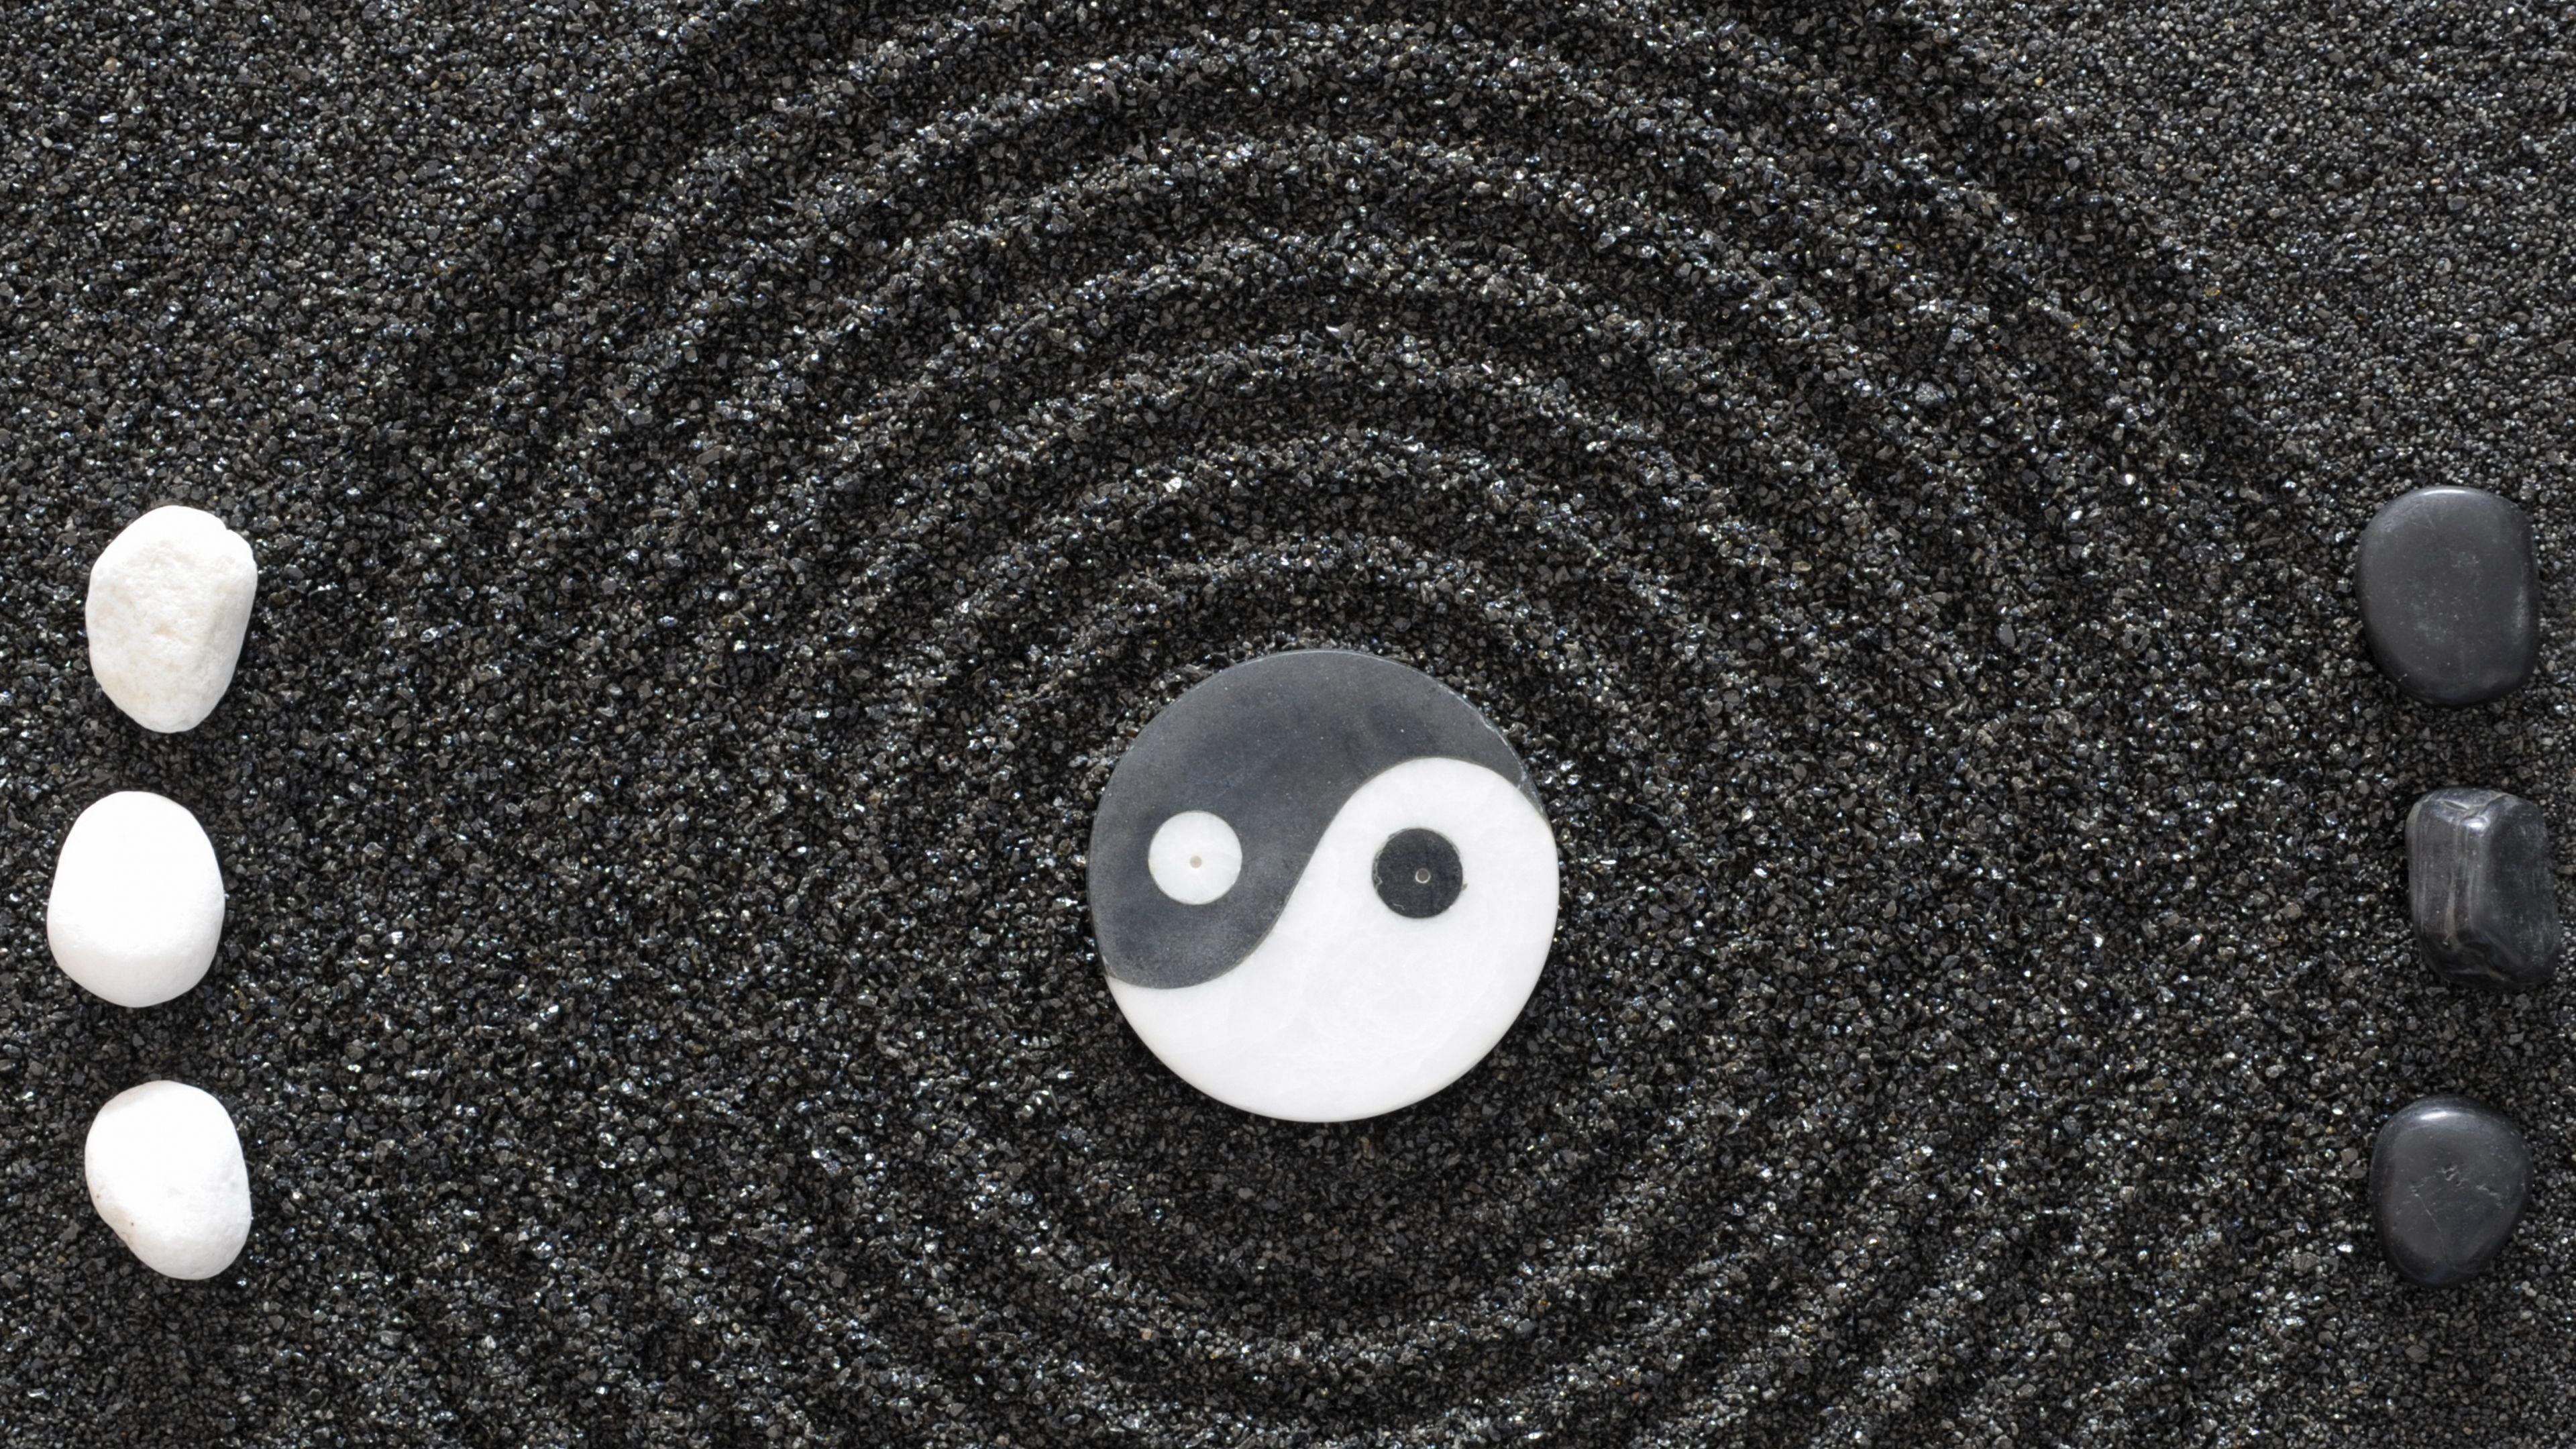 3840x2160 Wallpaper yinyang, stones, earth, symbol